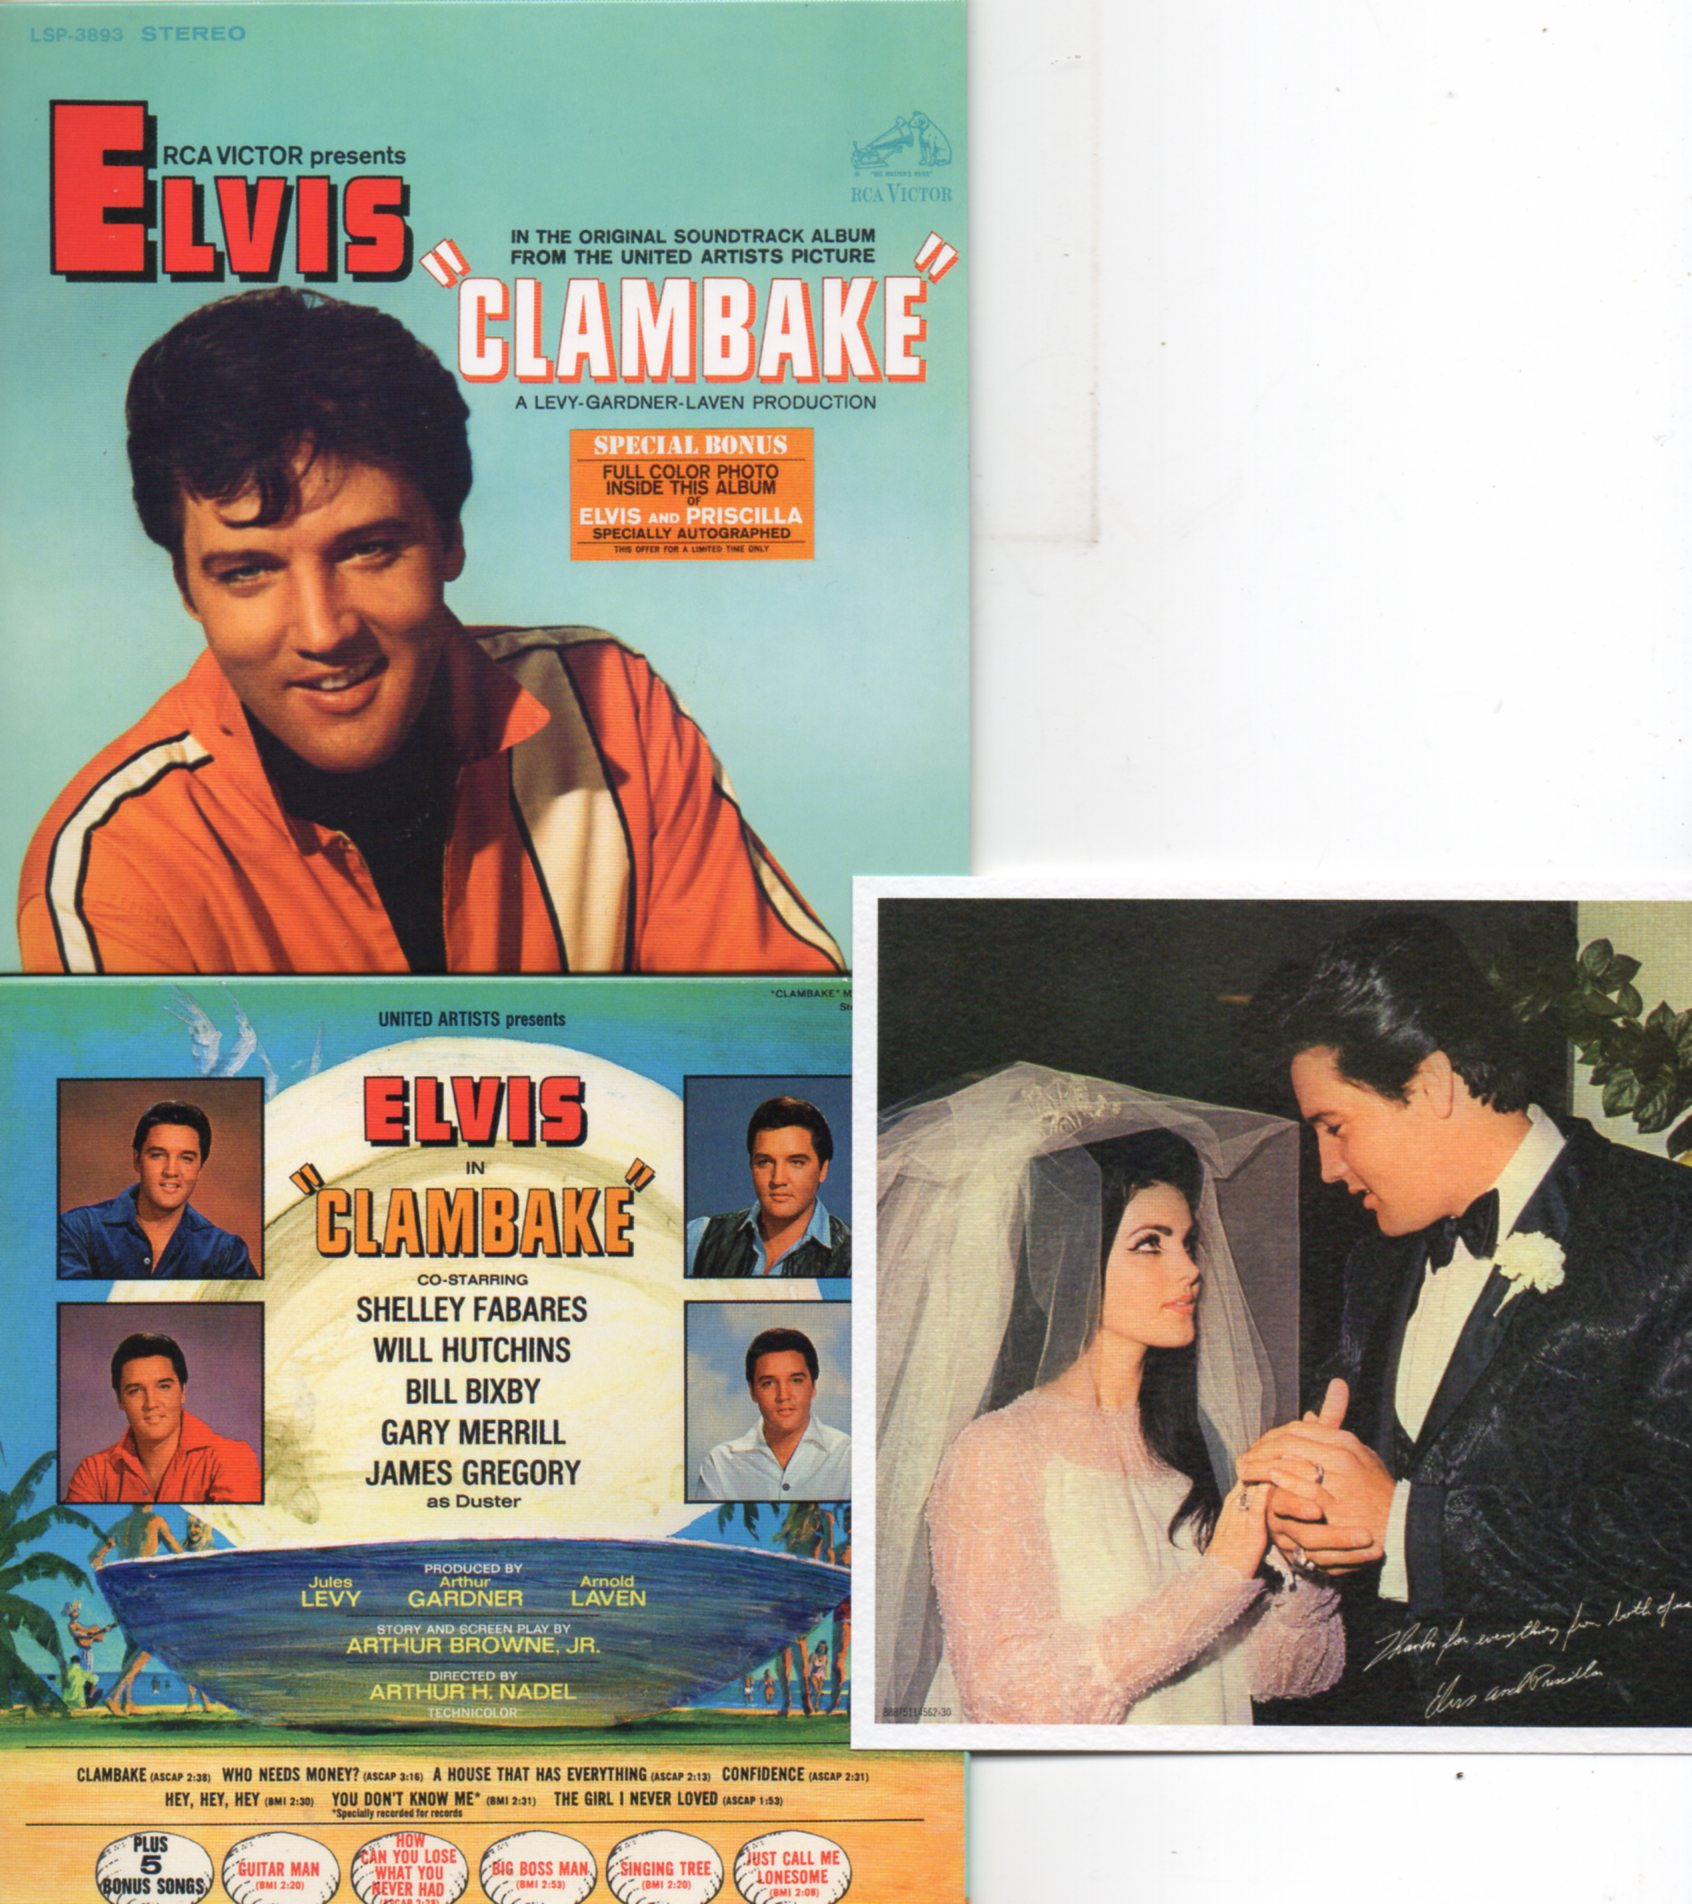 Elvis PRESLEY - Clambake (1967 - Mini Lp Replica - 13-track Card Sleeve)